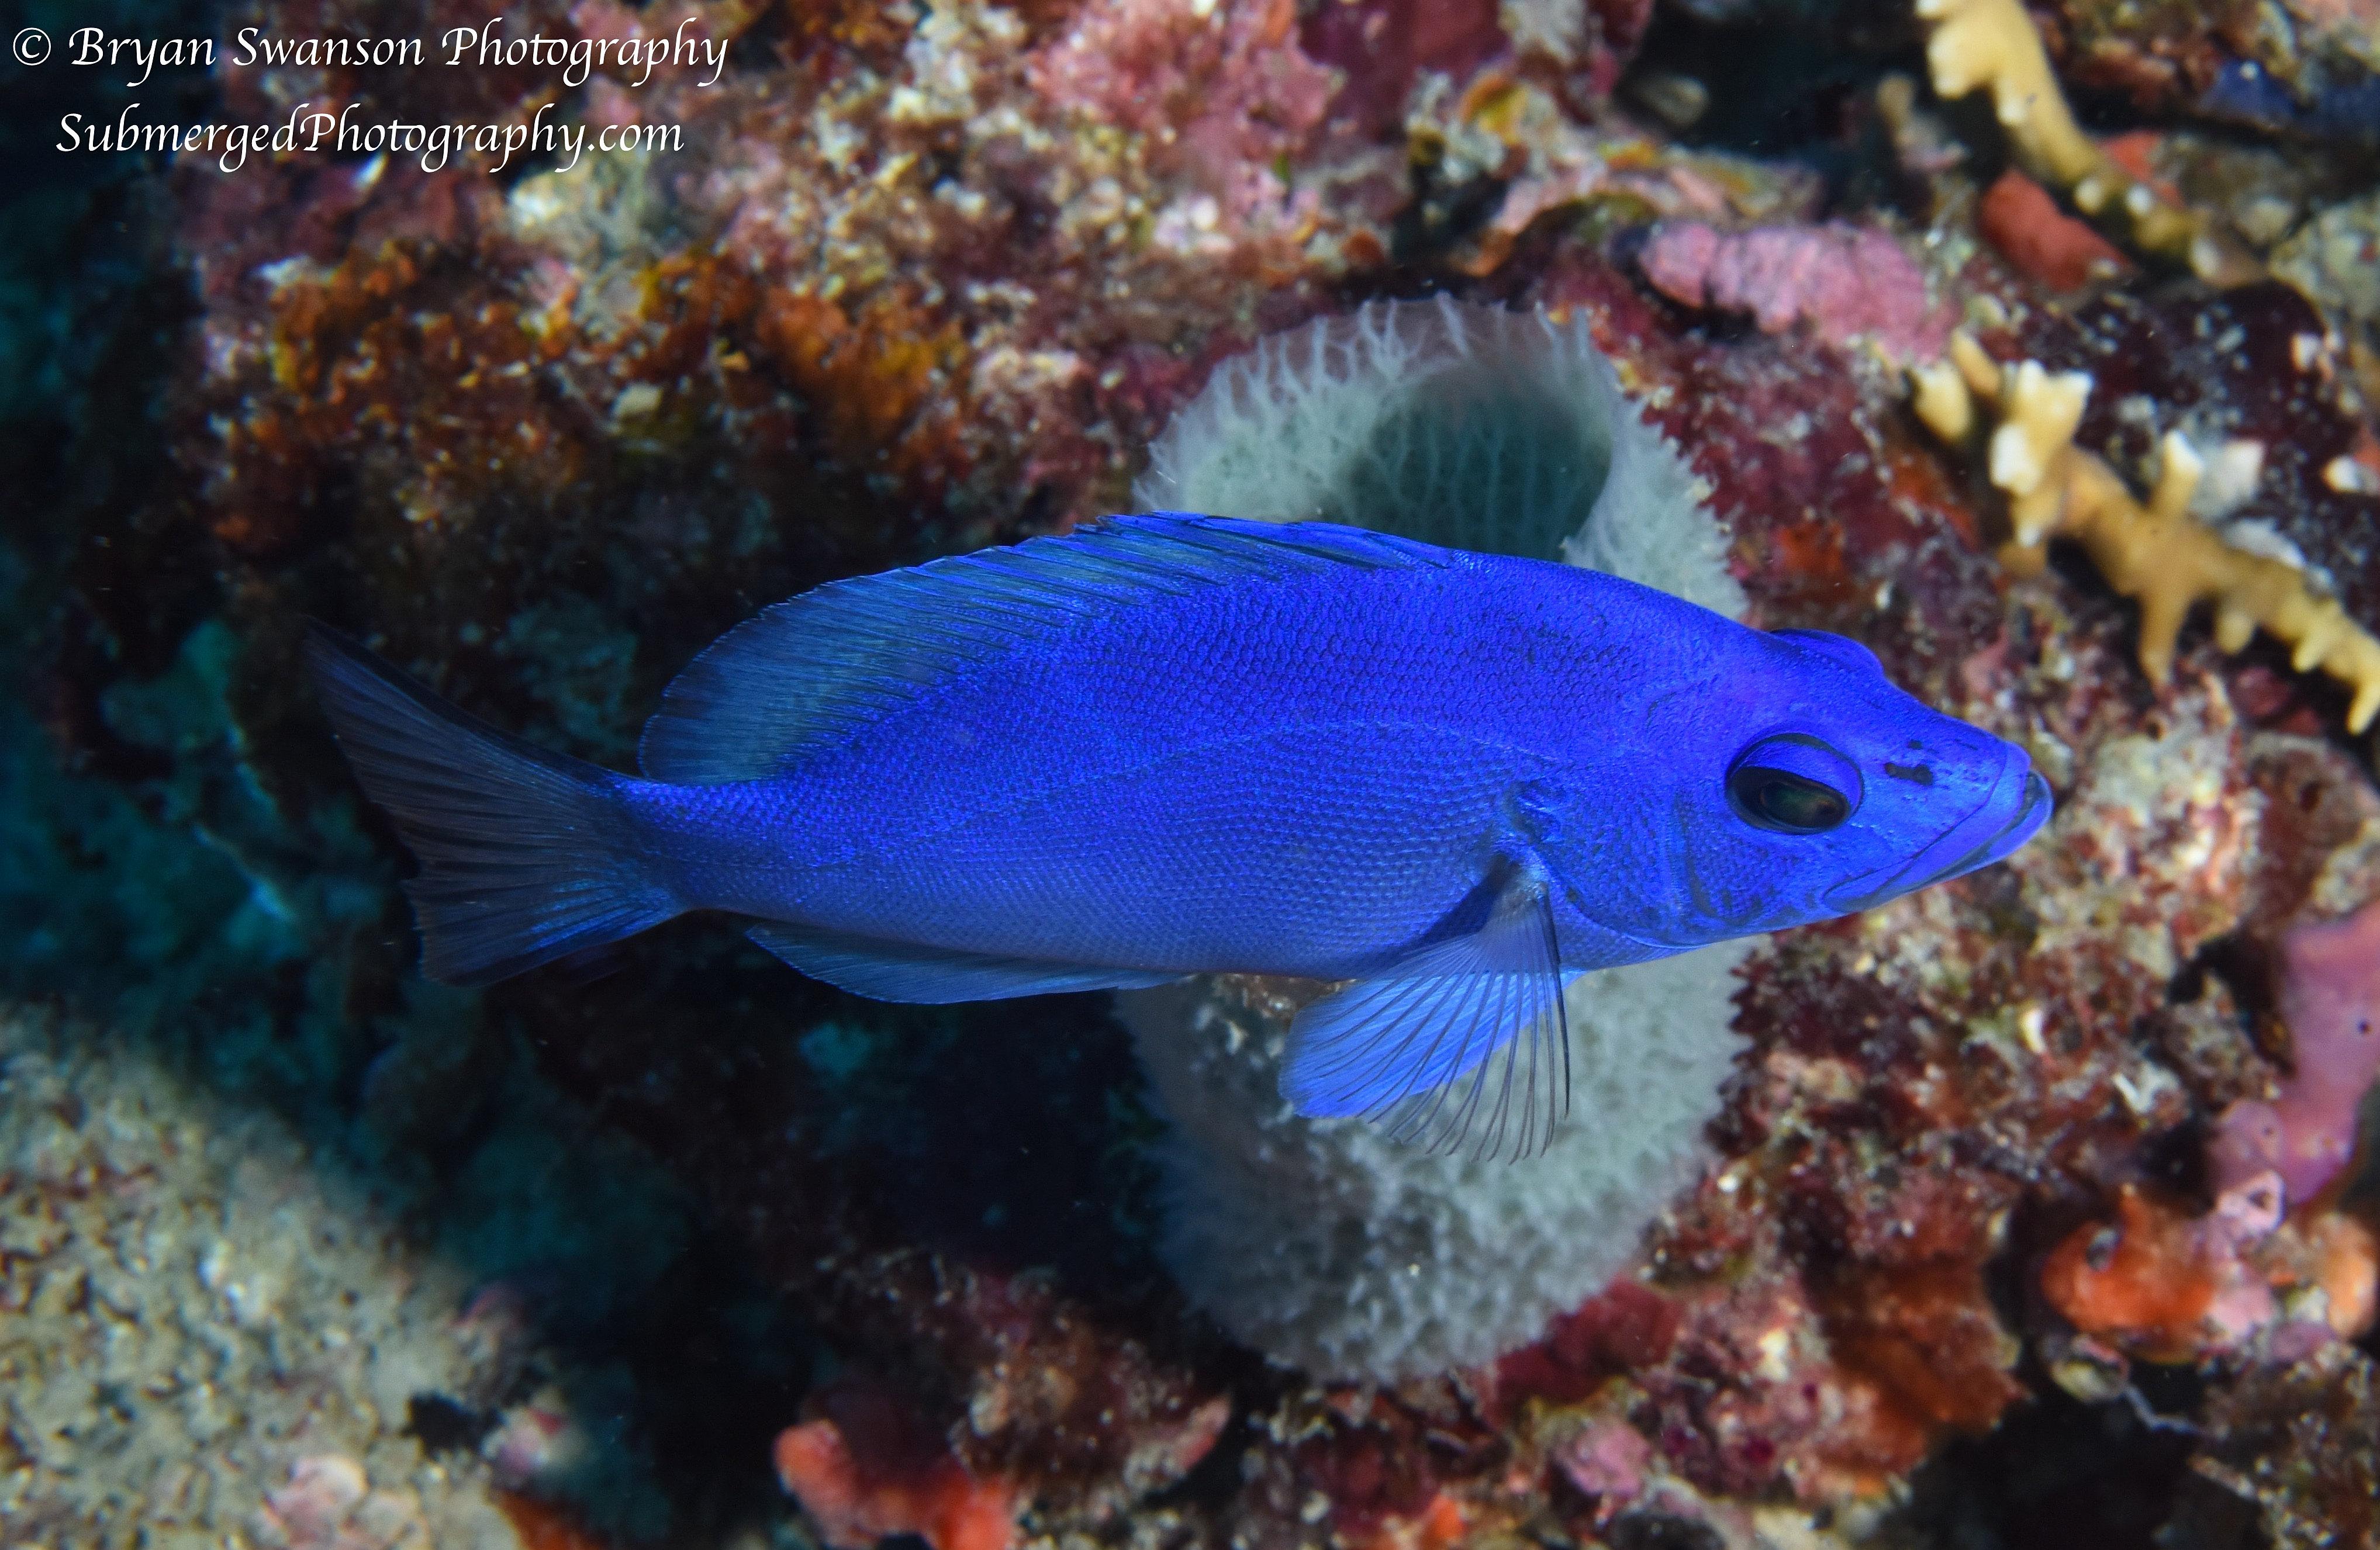 Bryan Swanson Uw Blue Hamlet Fish